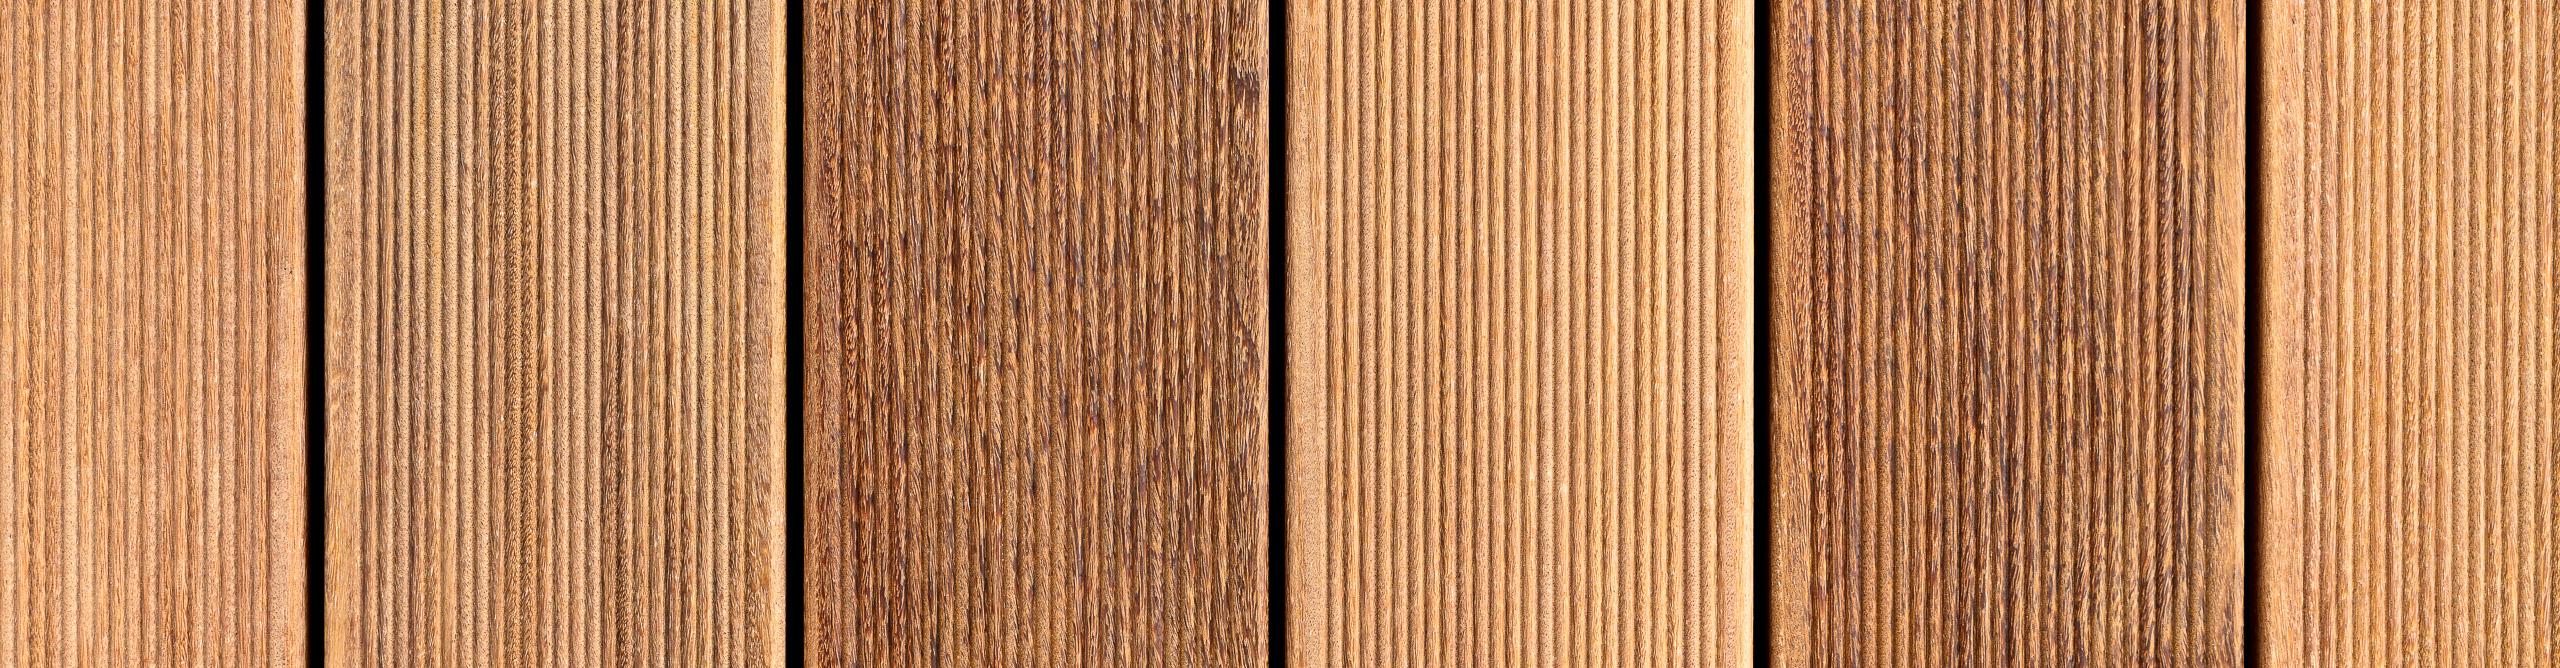 Cumaru trall i hårdträ, Kärnsund Wood Link